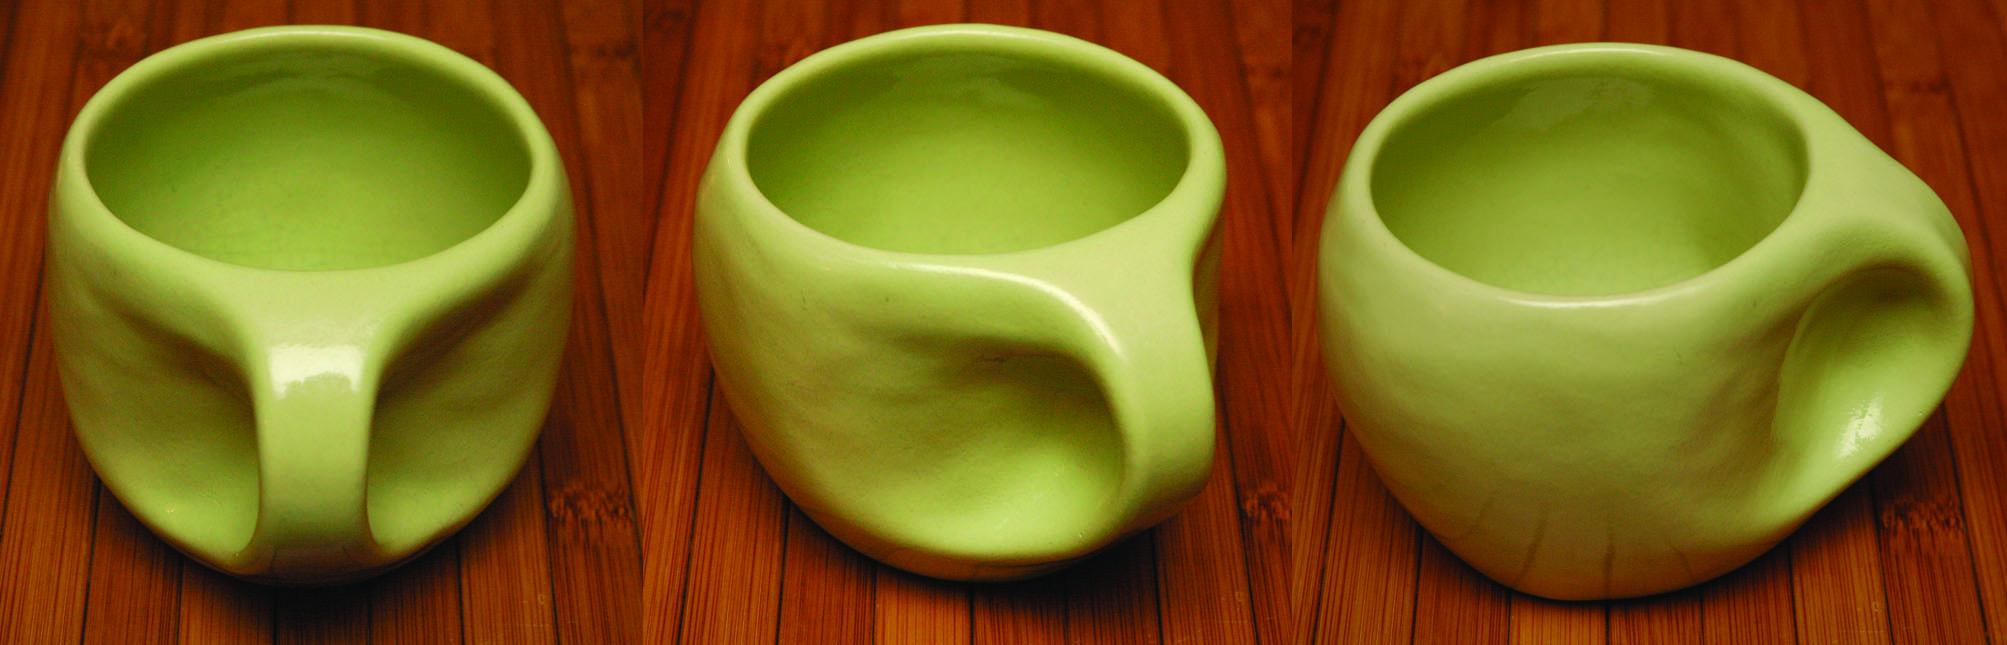 prototype cup